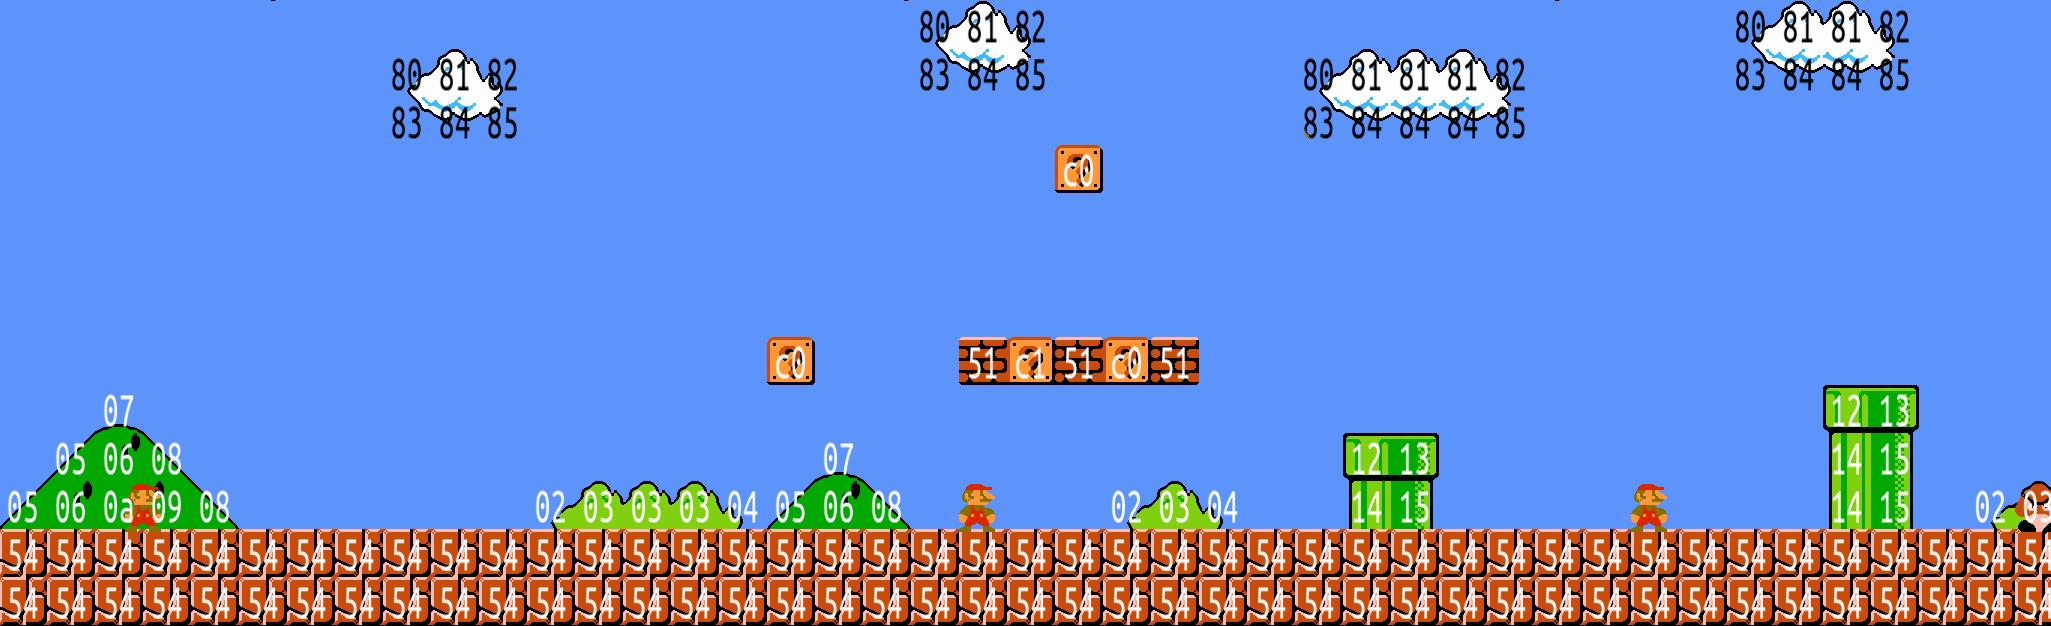 Super Mario 3d World Wallpaper Extracting Super Mario Bros Levels With Python Matt S